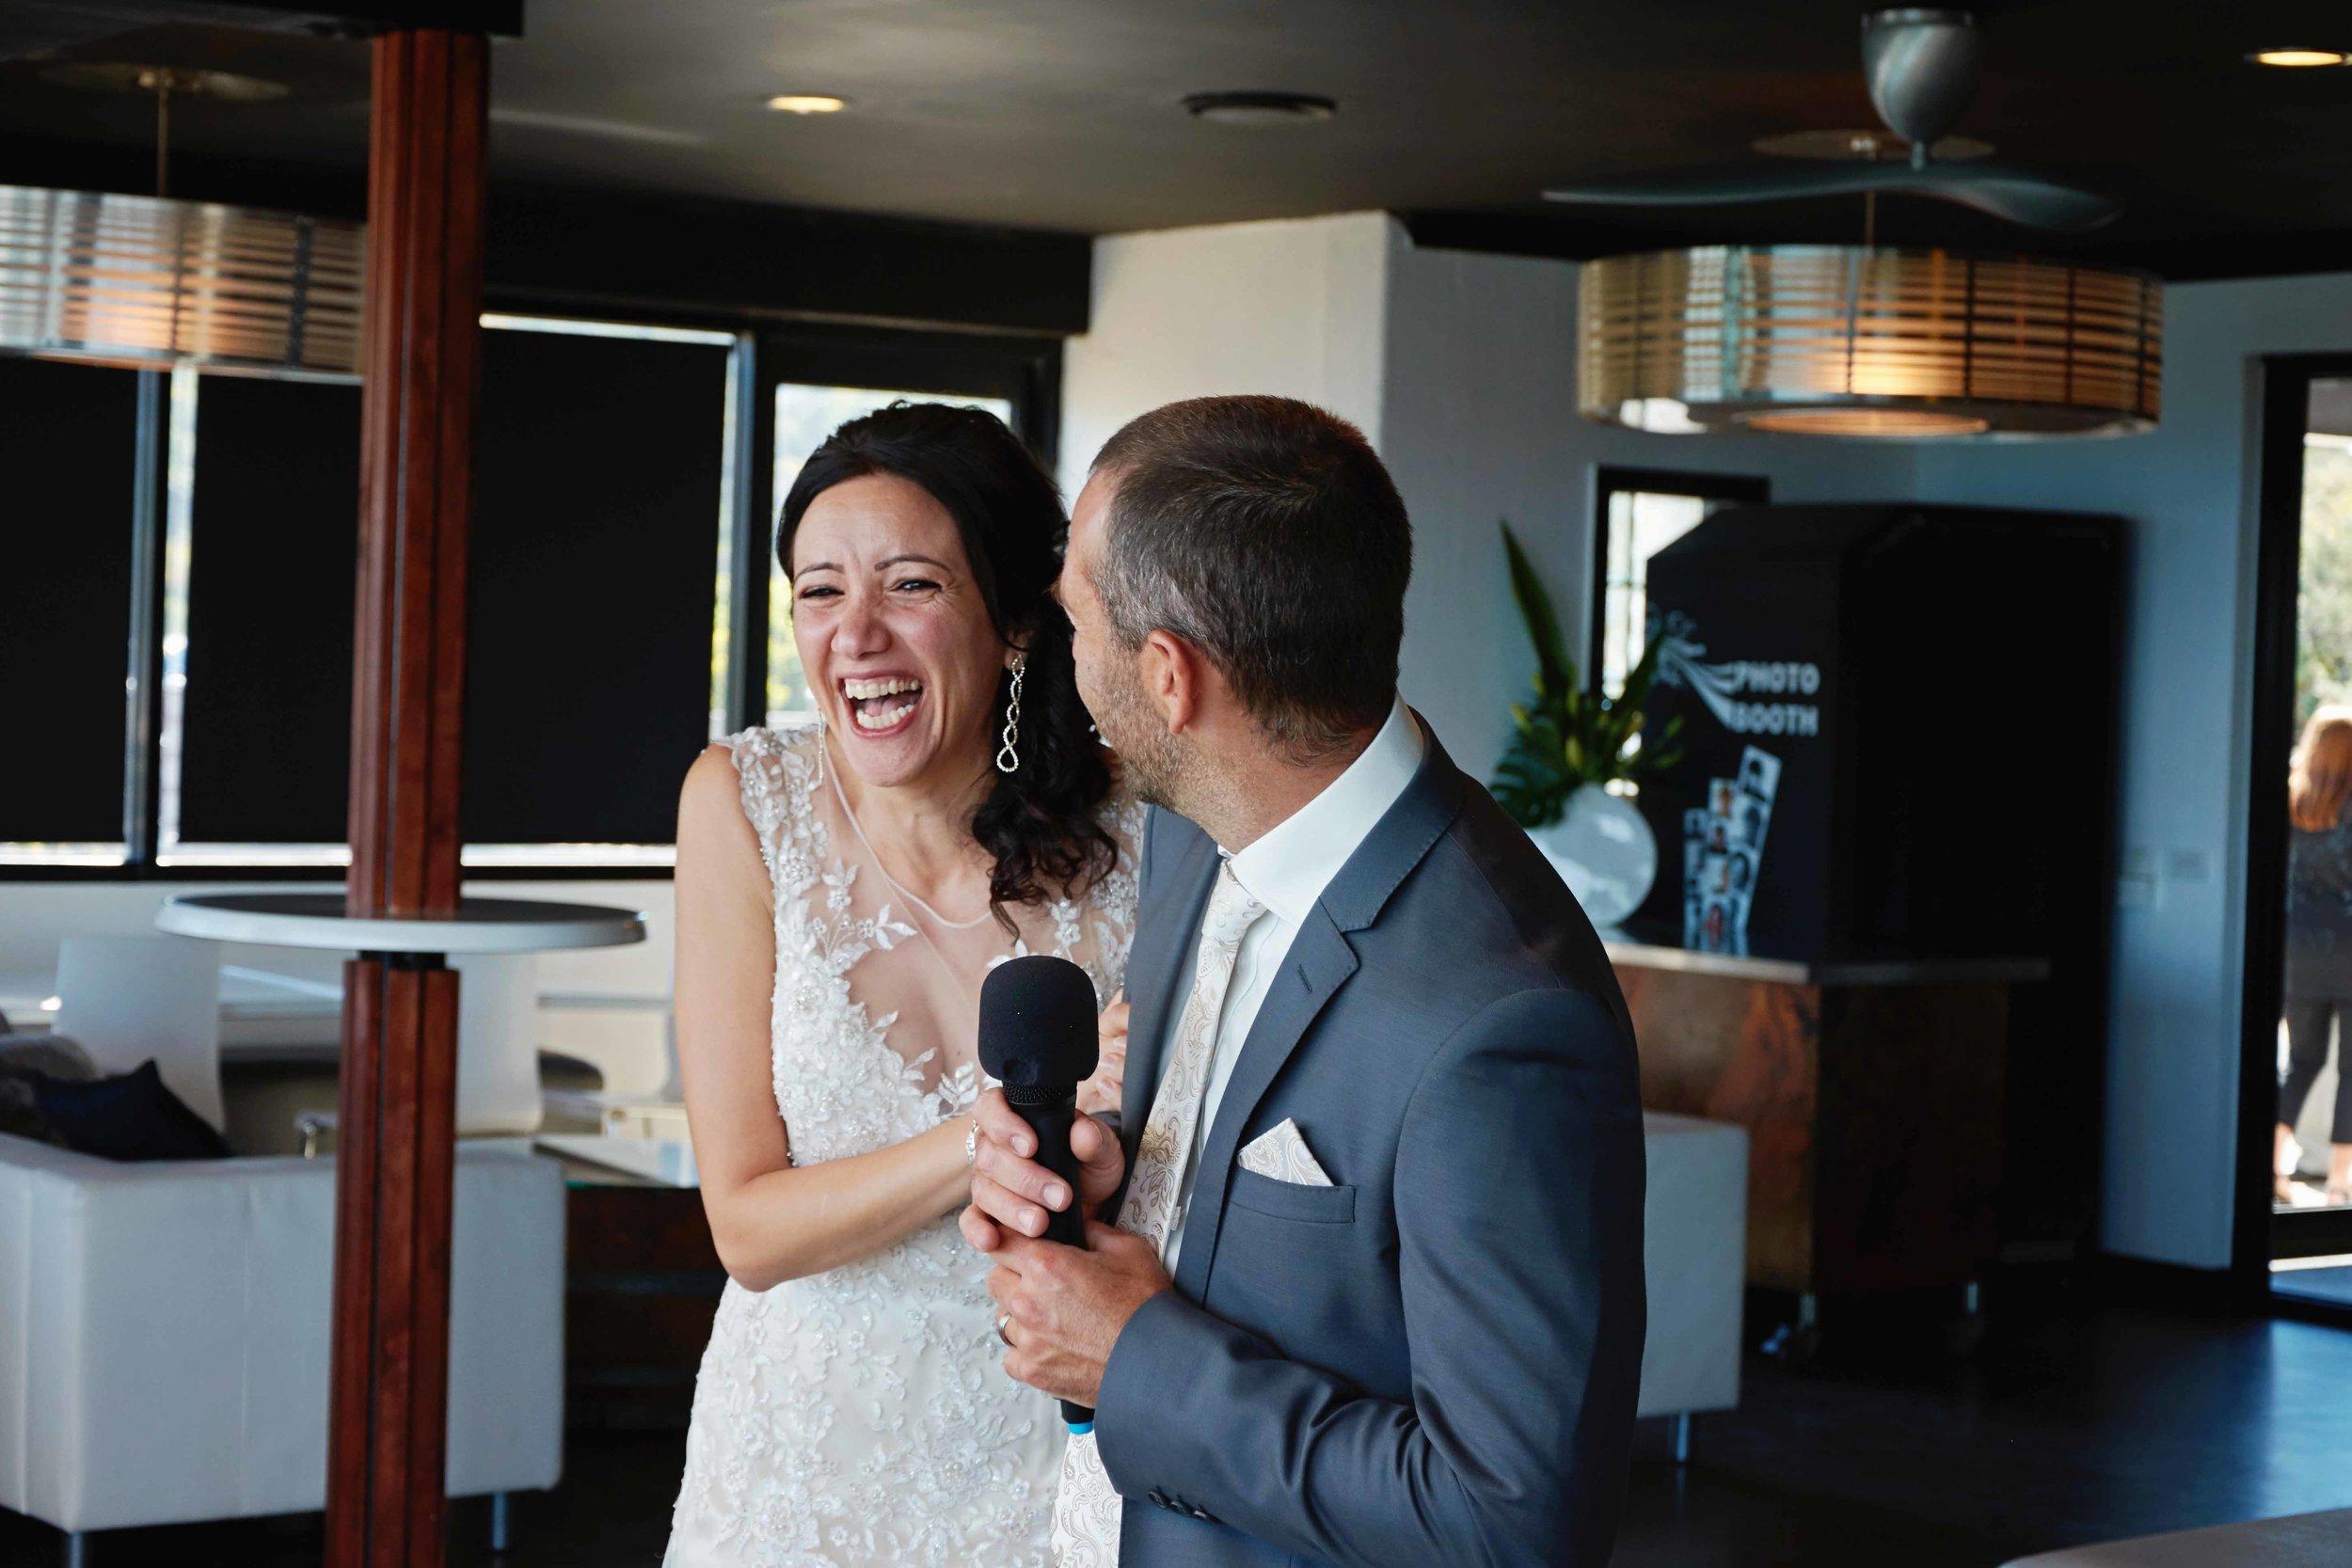 sorrento-wedding-photography-all-smiles-marissa-jade-photography-93.jpg